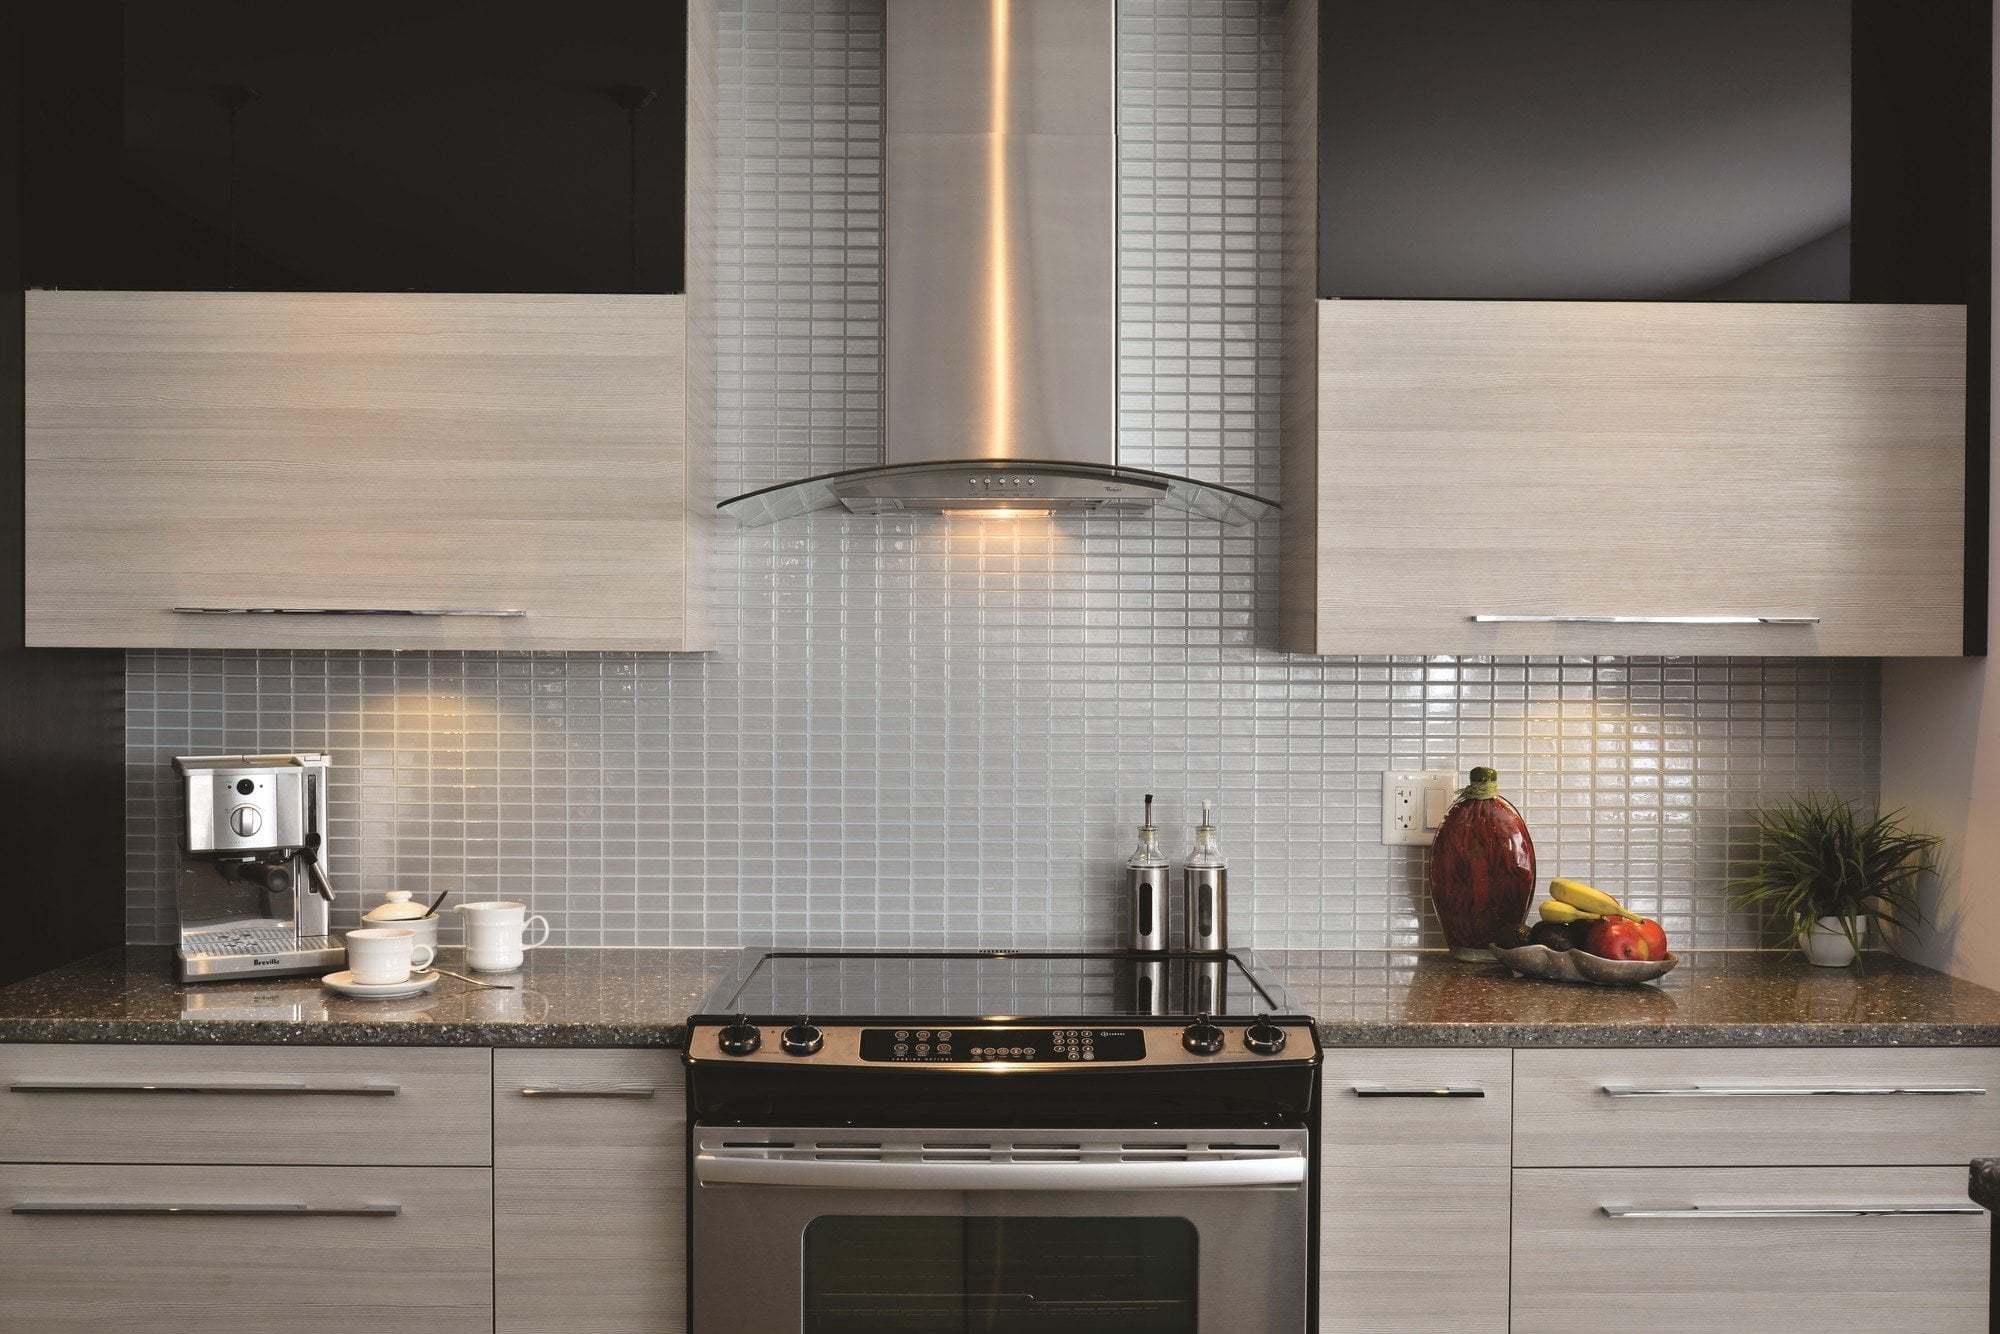 Kitchen Bathroom Wall TilesDecorated Life. Smart Tiles Bathroom   josael com